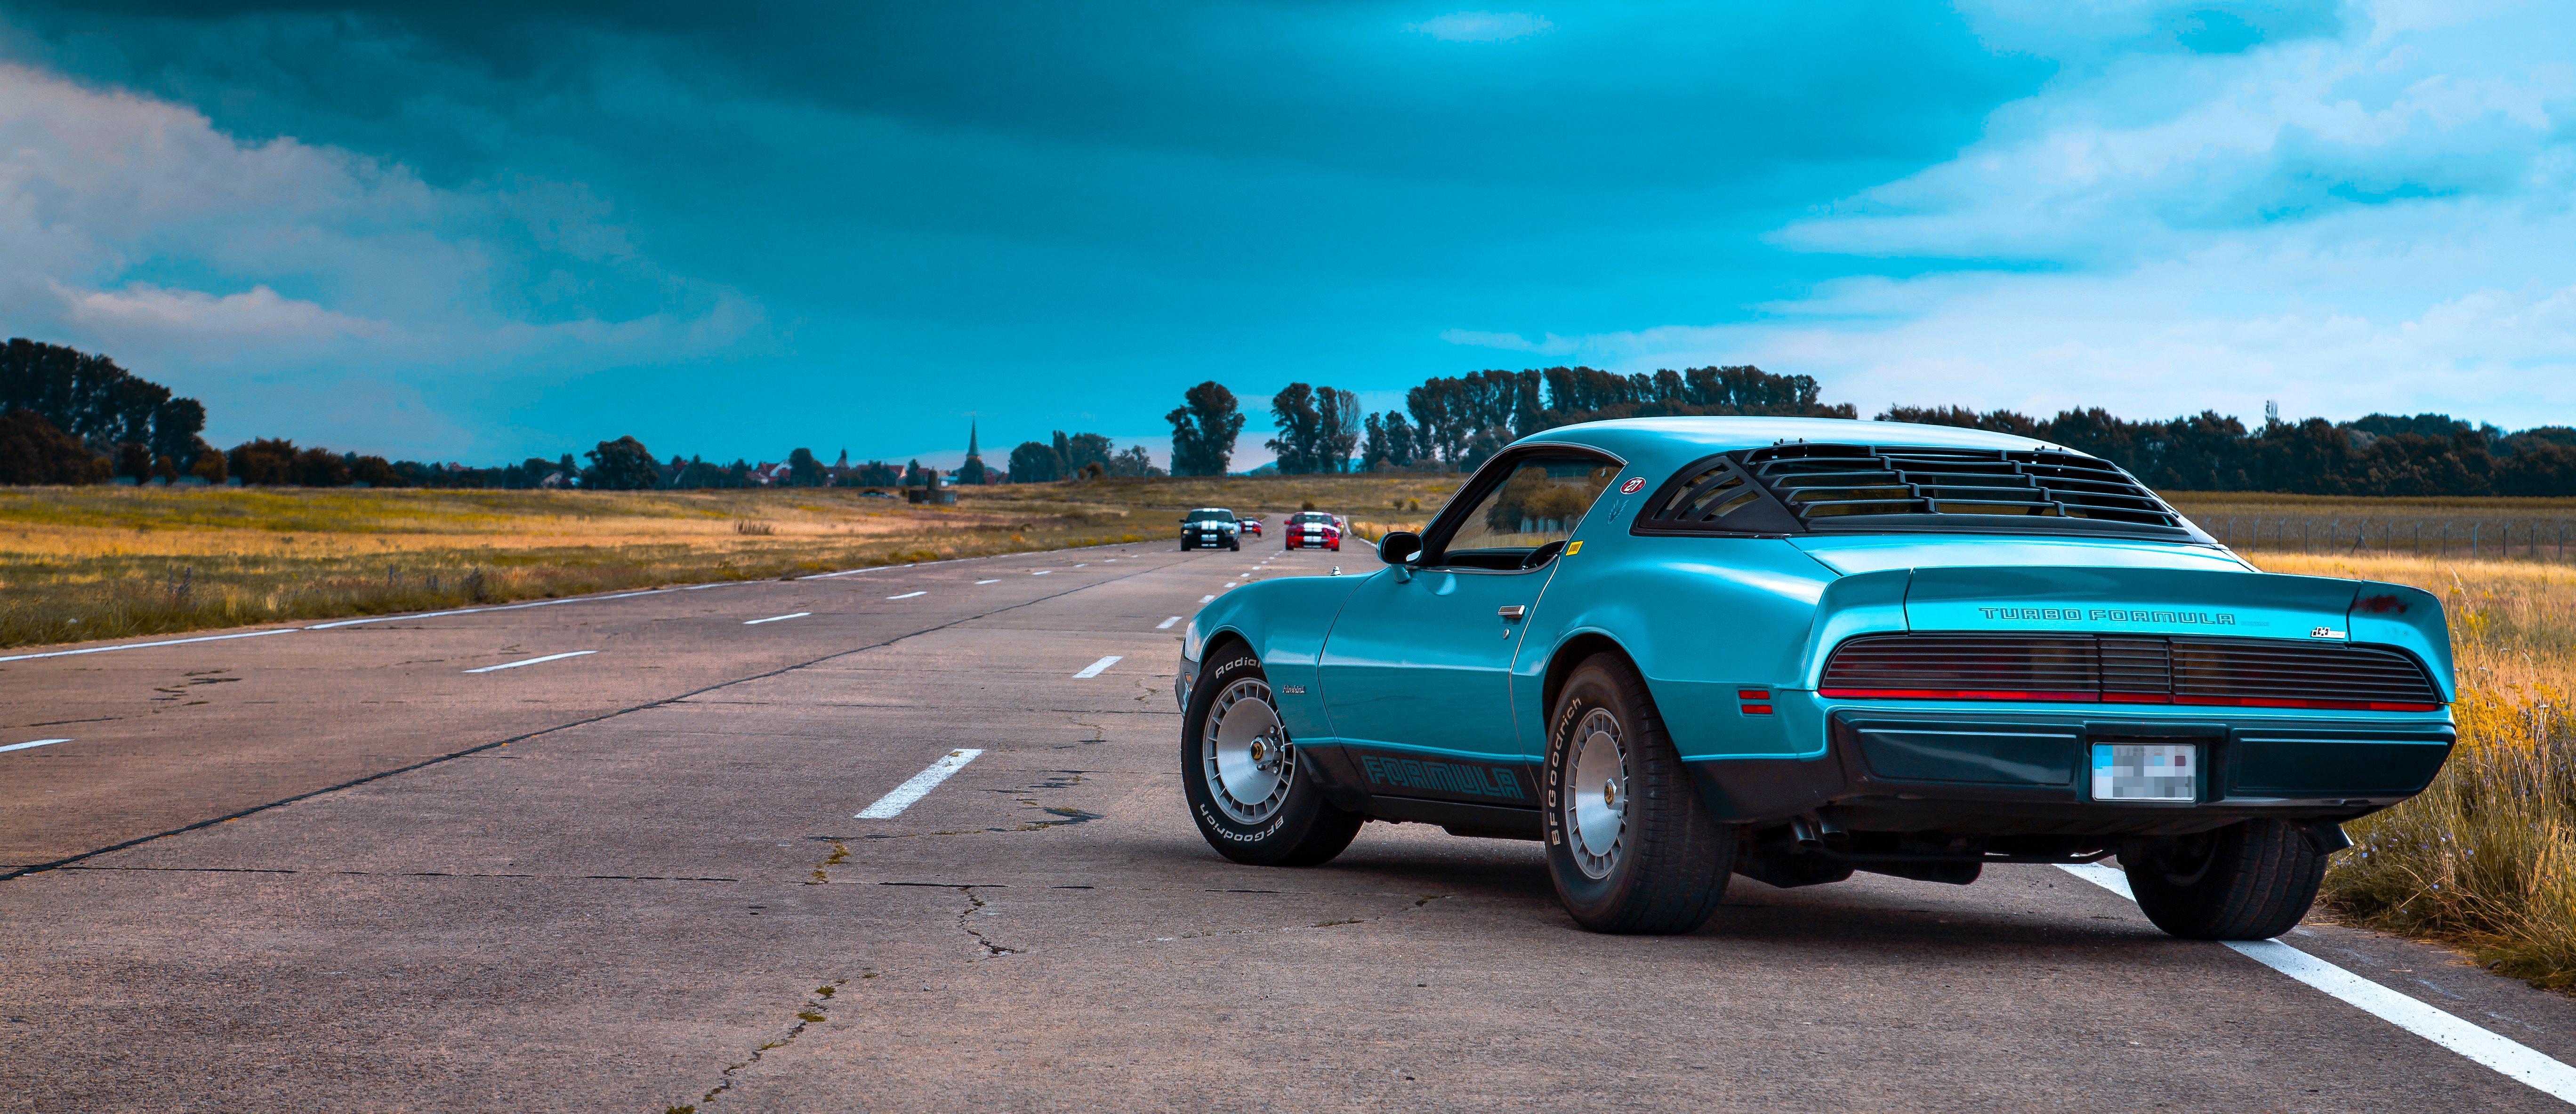 Dodge muscle car 5k hd cars 4k wallpapers images - Dodge car 4k wallpaper ...